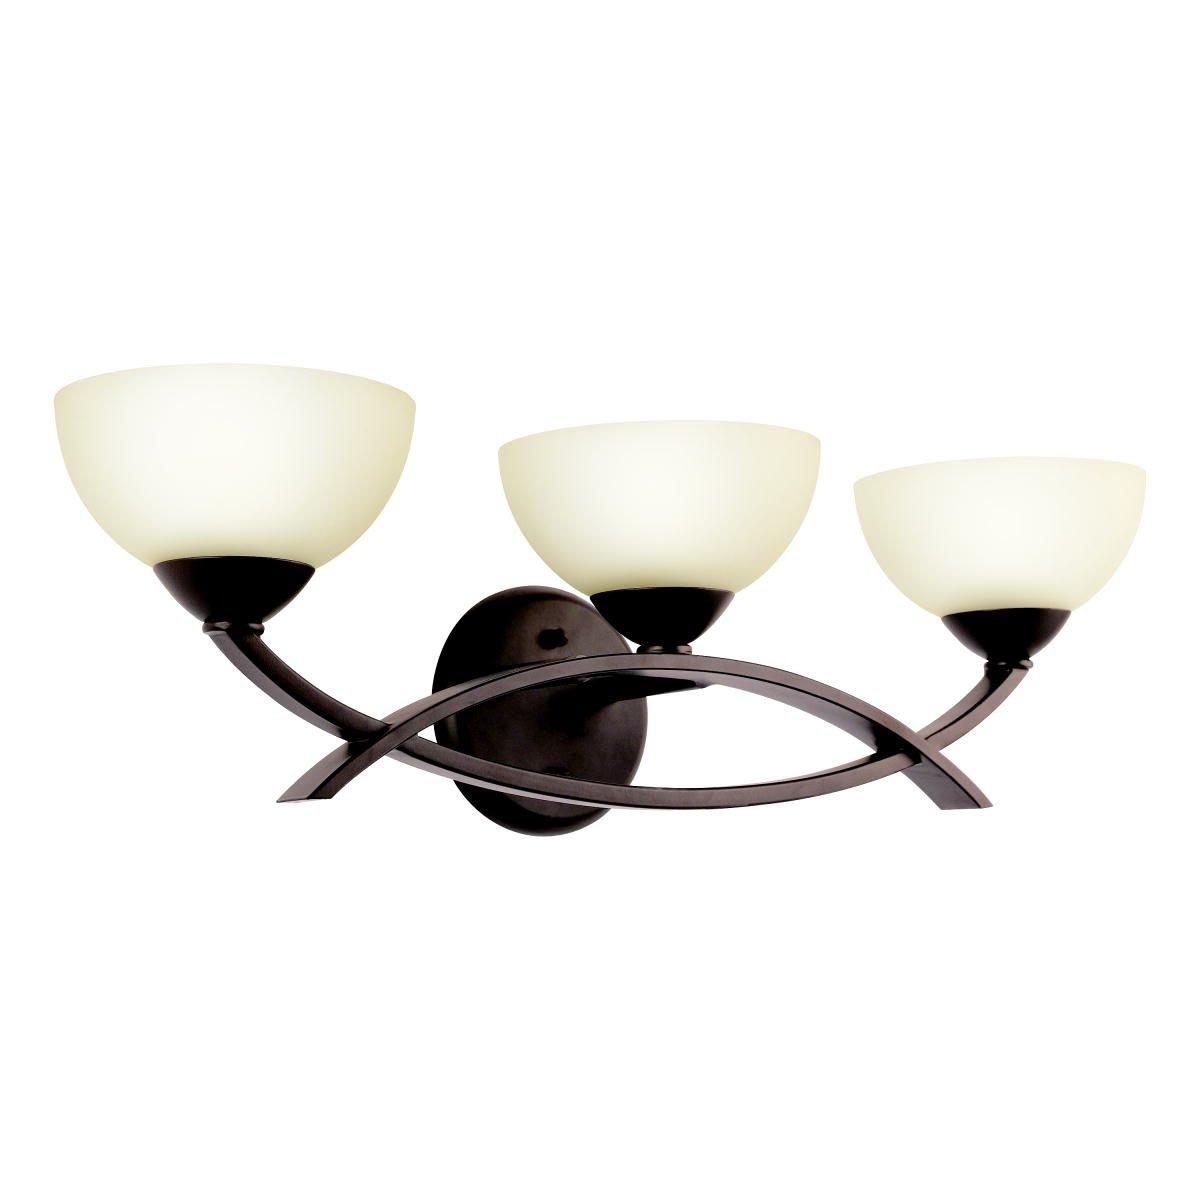 Kichler Lighting 45163OZ Bellamy 3-Light Halogen Bath Light, Olde Bronze